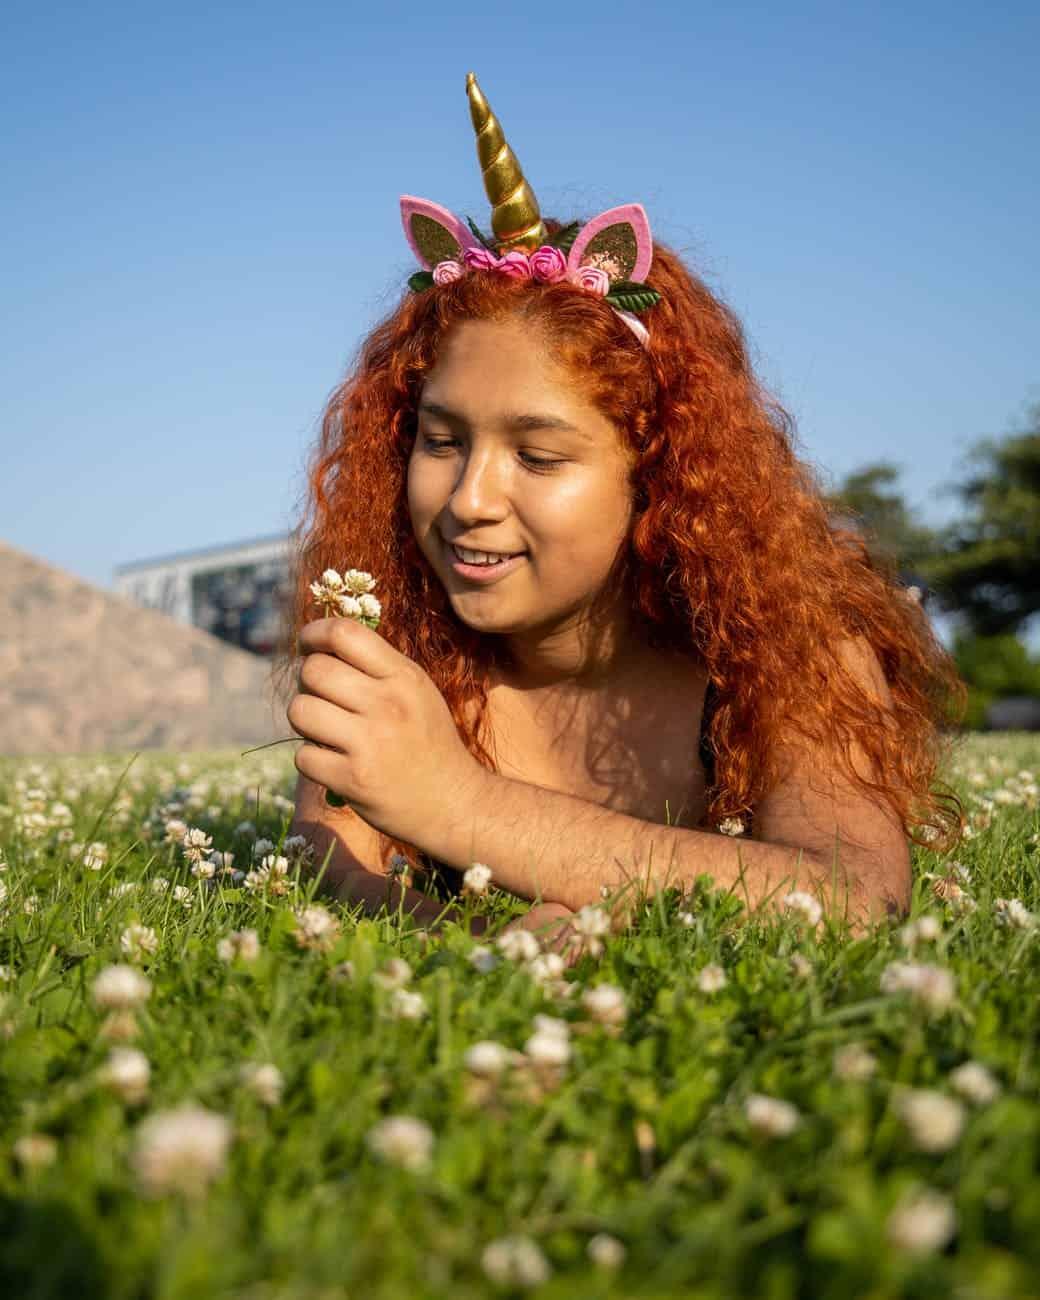 photo of a woman wearing unicorn headband looking at flowers